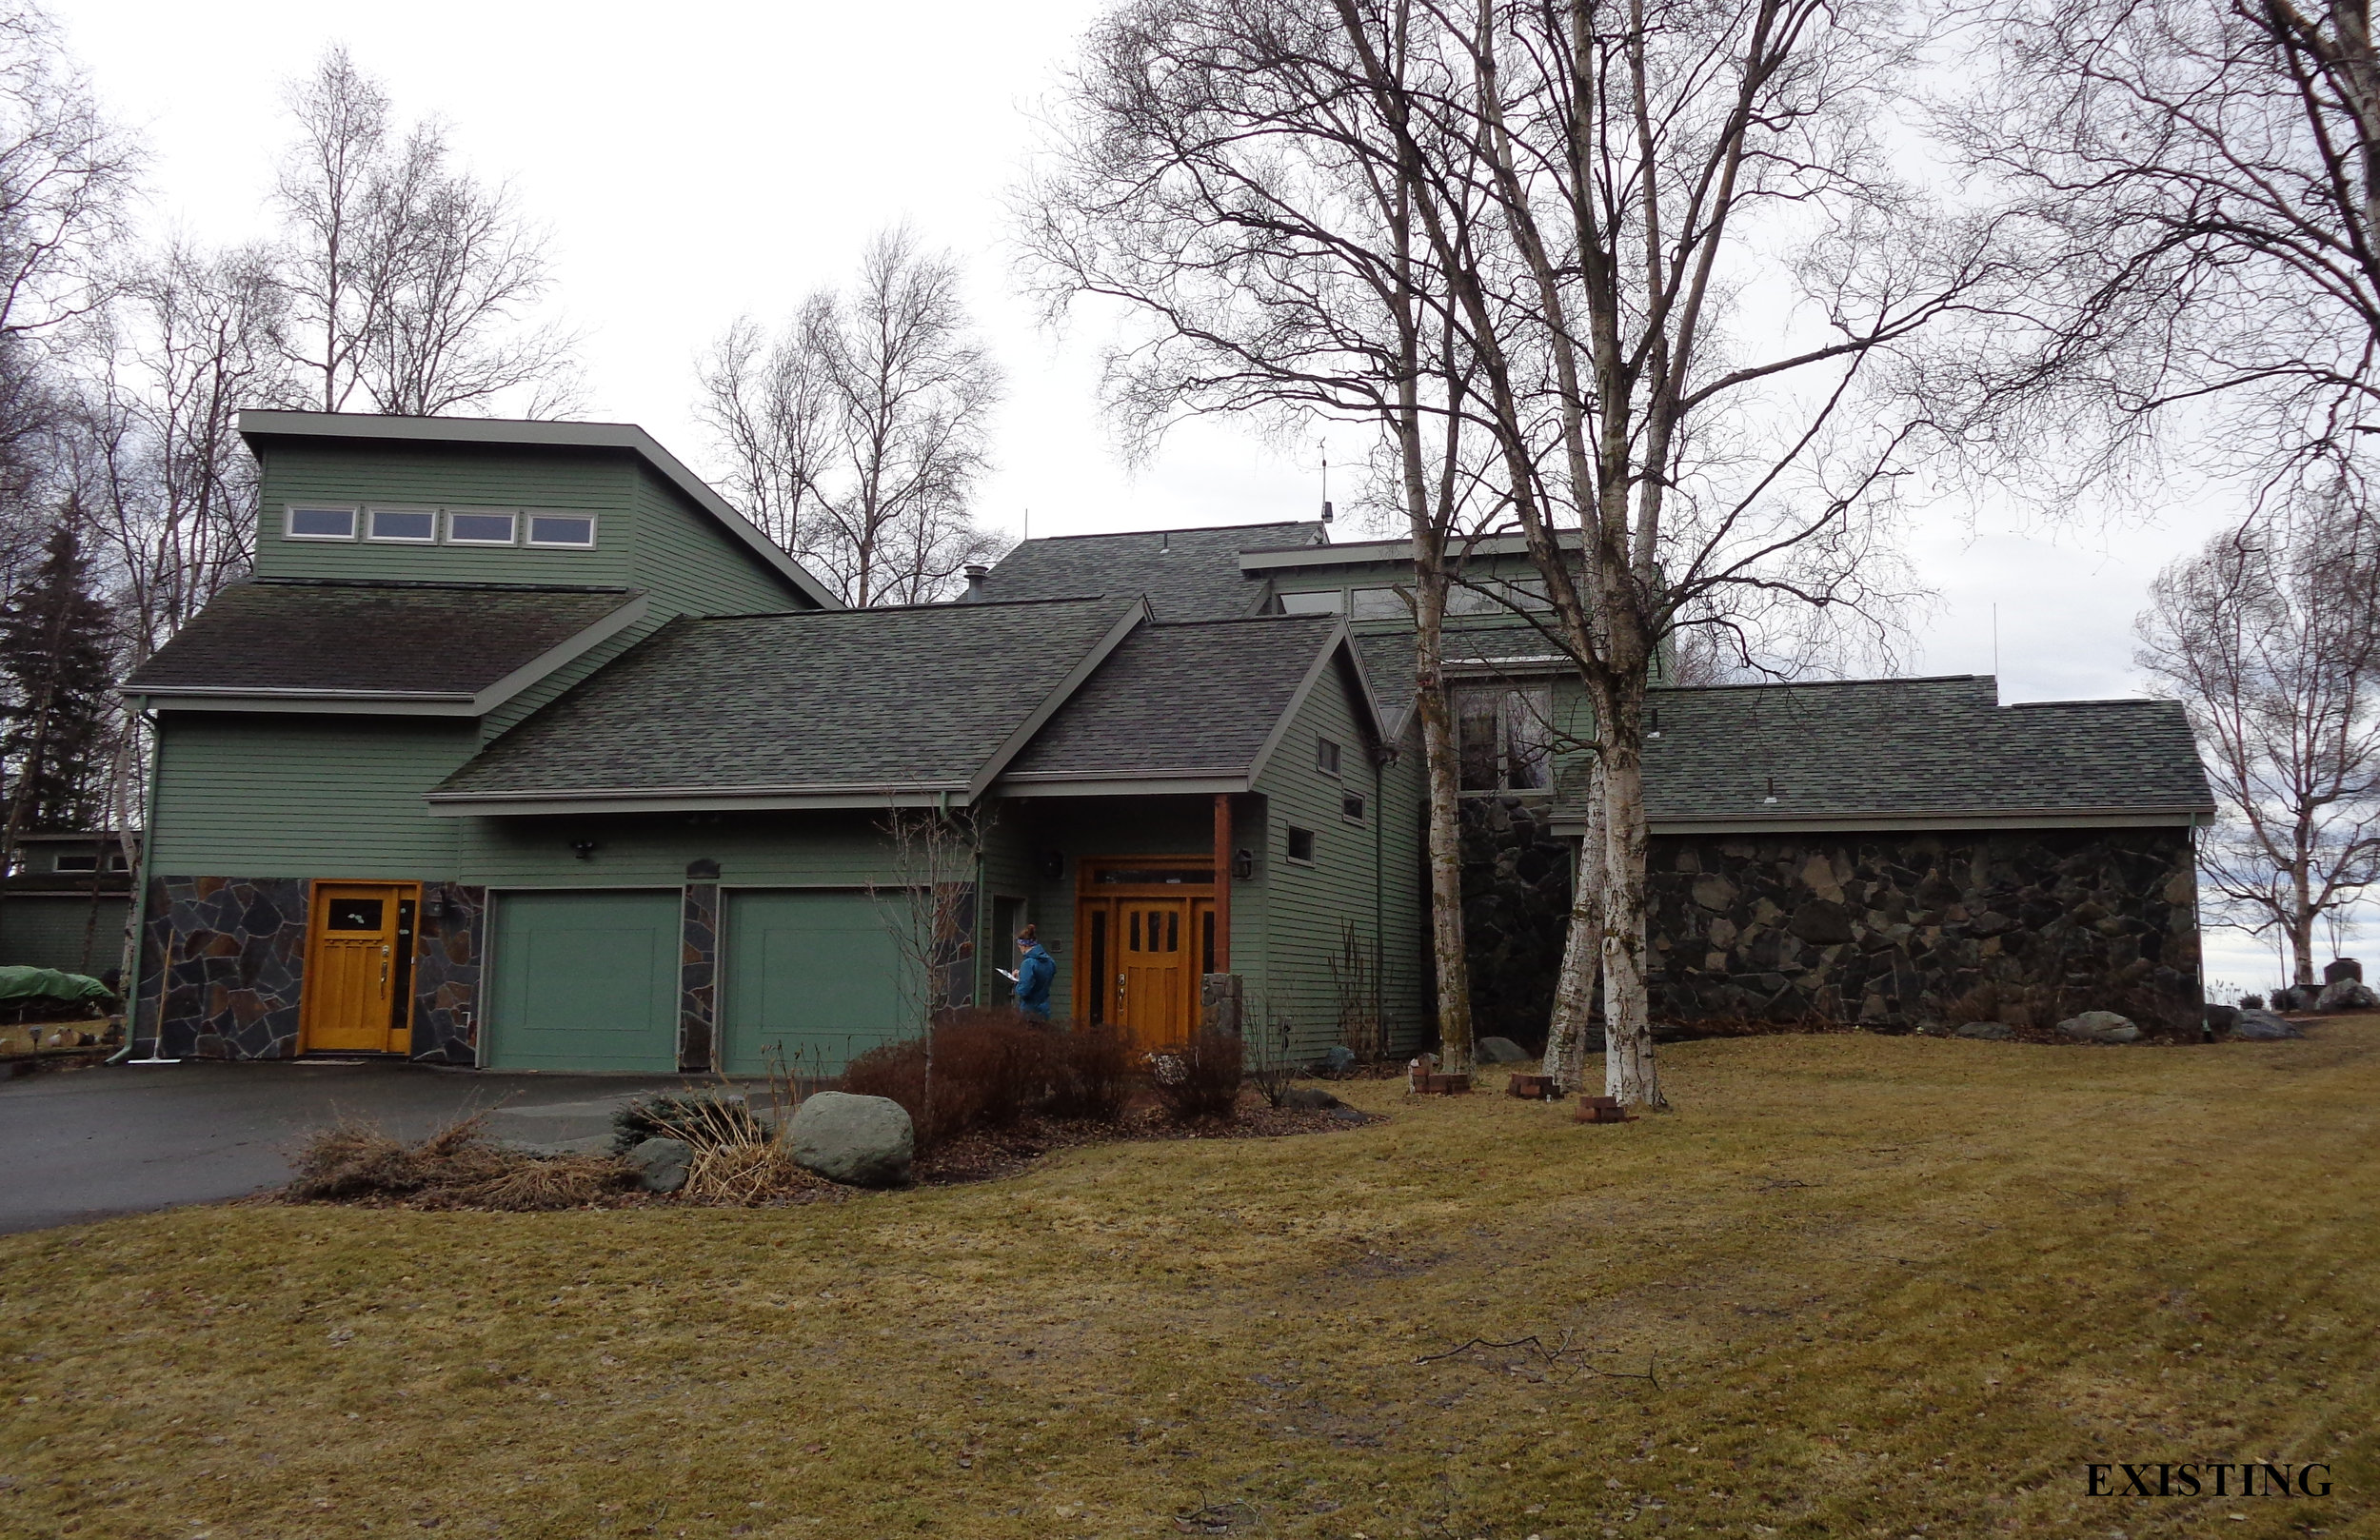 Turnagain Bluff Existing House (2).JPG